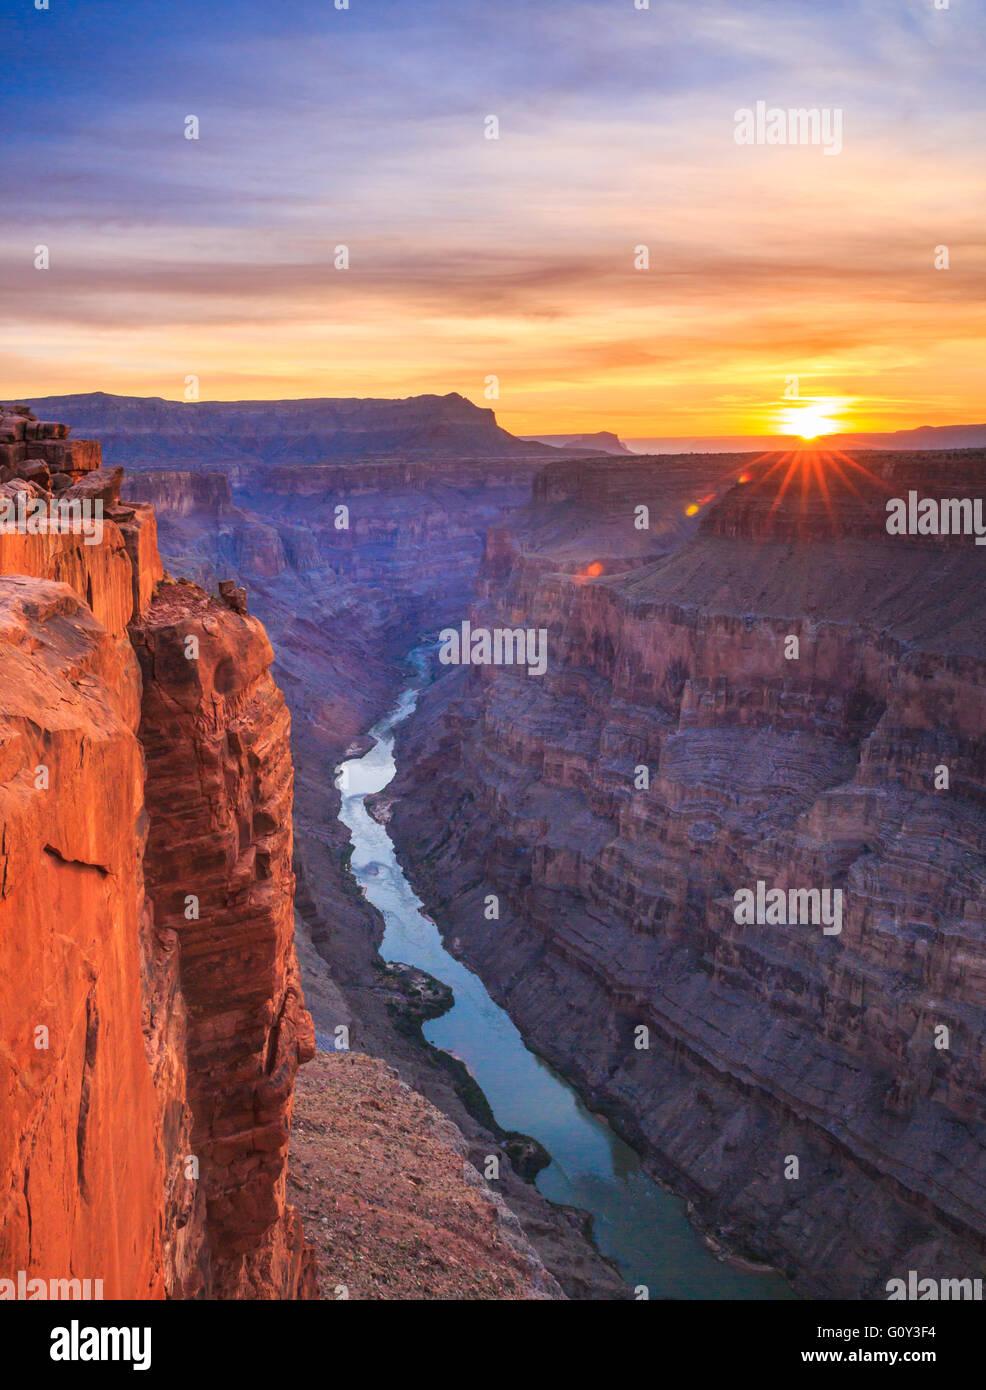 Sonnenaufgang über dem Colorado River im Toroweap Overlook im Grand Canyon National Park, arizona Stockfoto